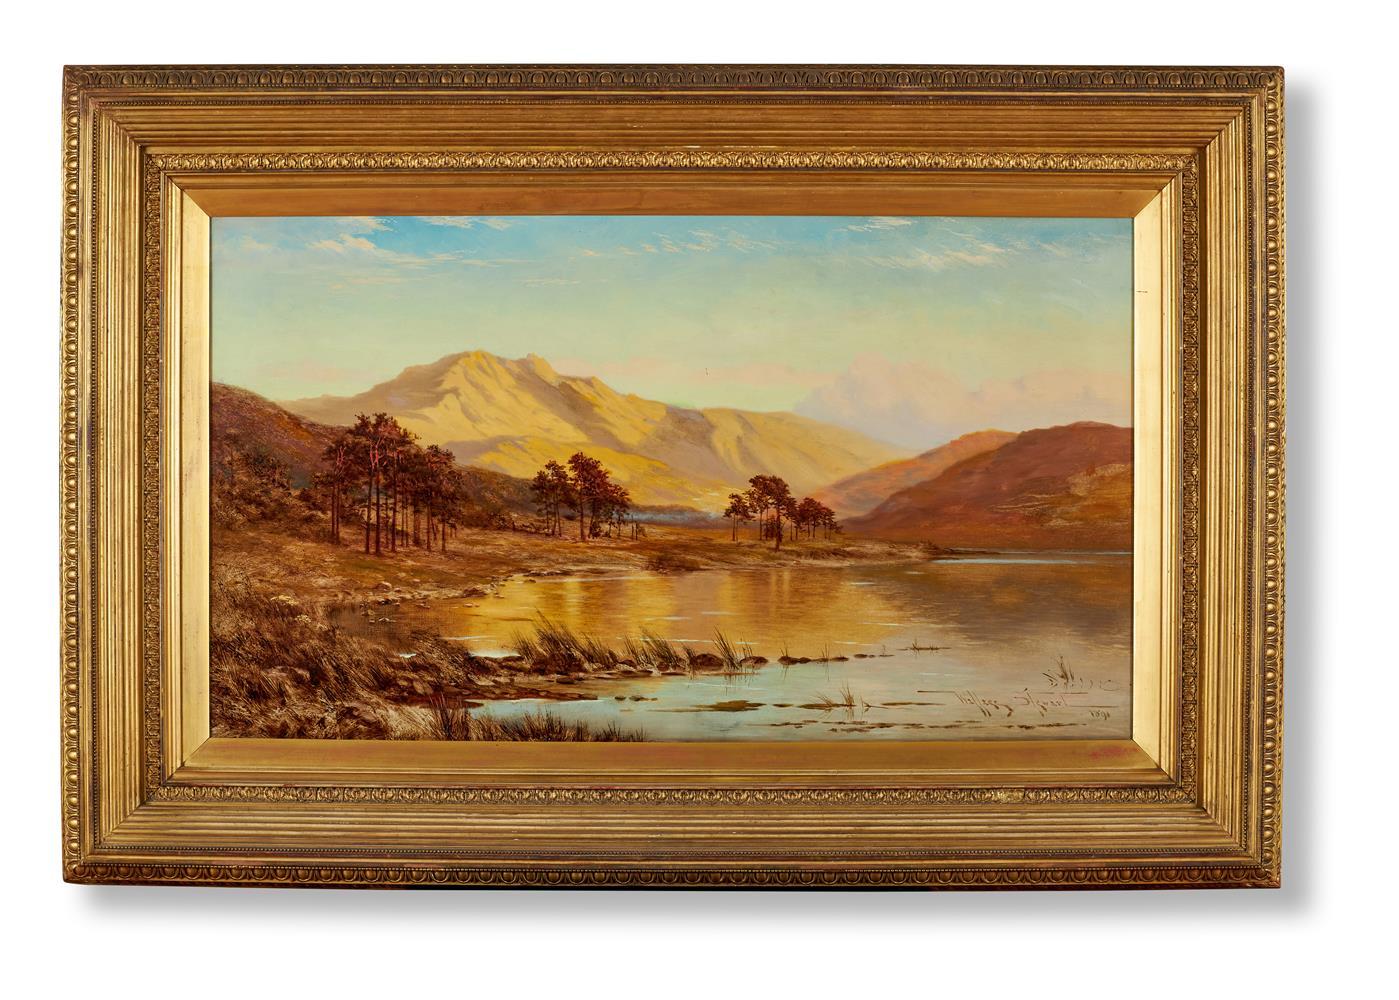 WALLACE STEWART (19TH CENTURY), HIGHLAND LOCH